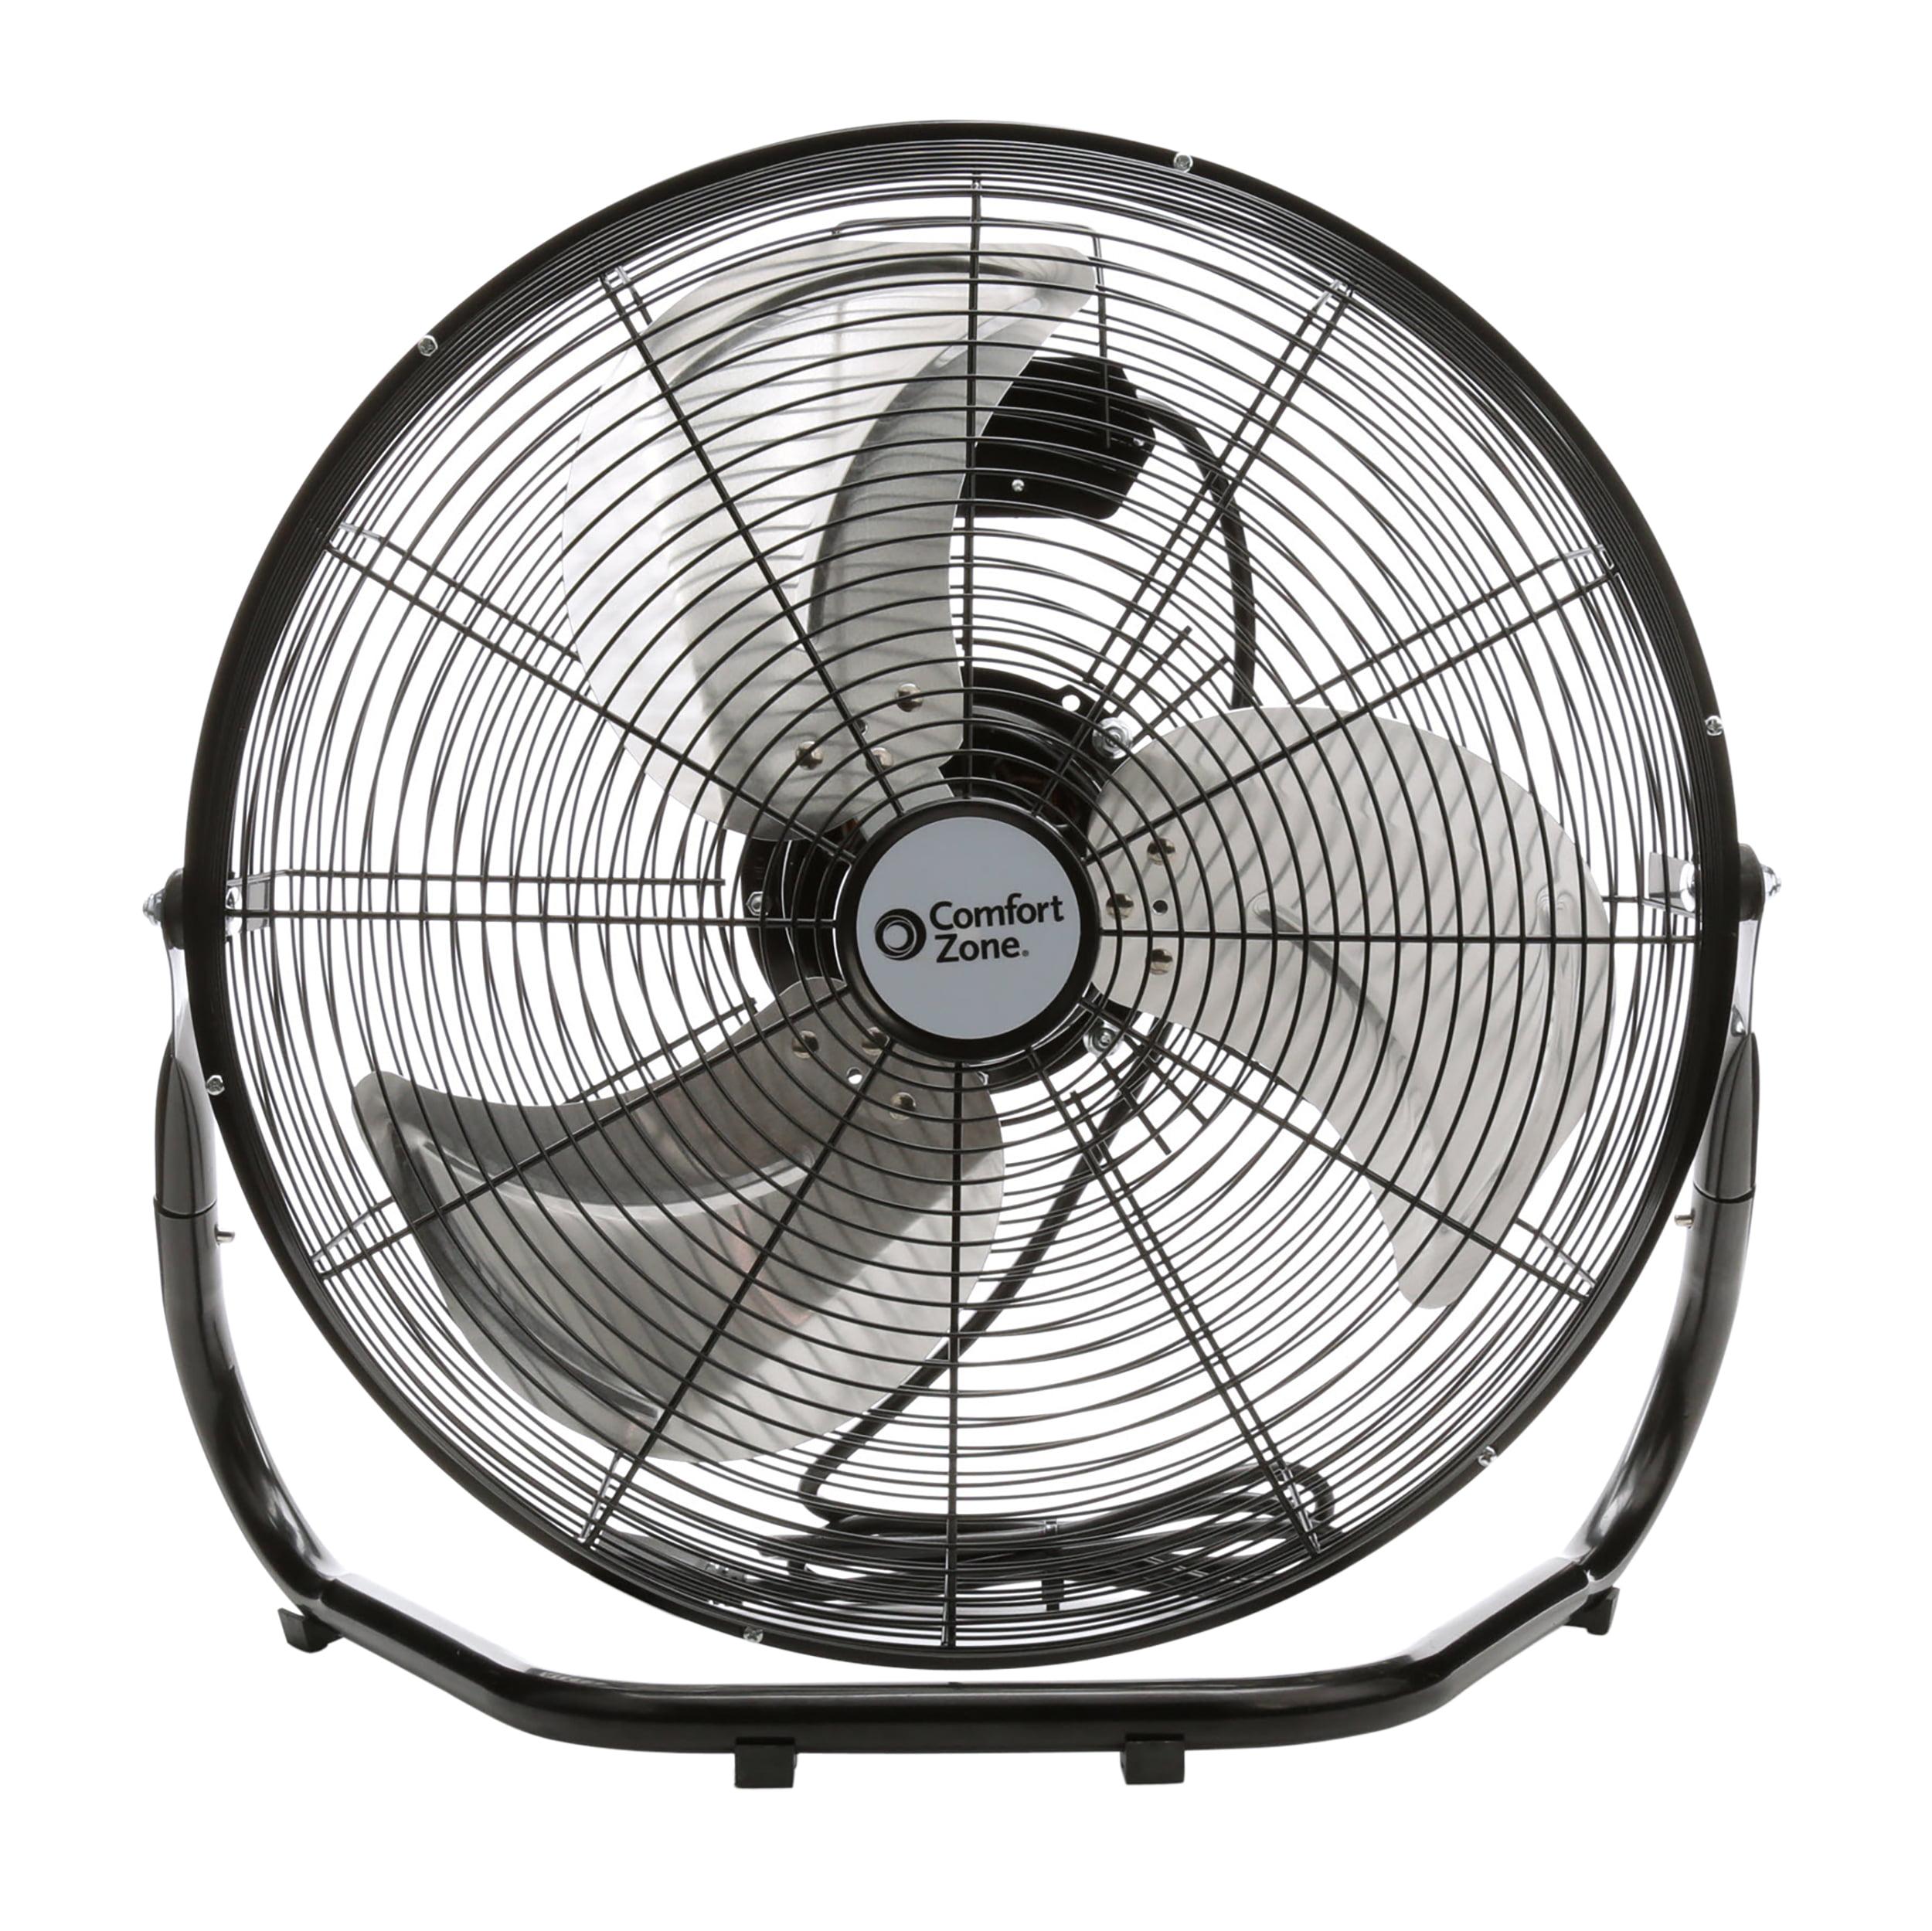 Comfort Zone 18'' High Velocity 3-Speed Fan, Model #CZHV18B, Black by World and Main, LLC